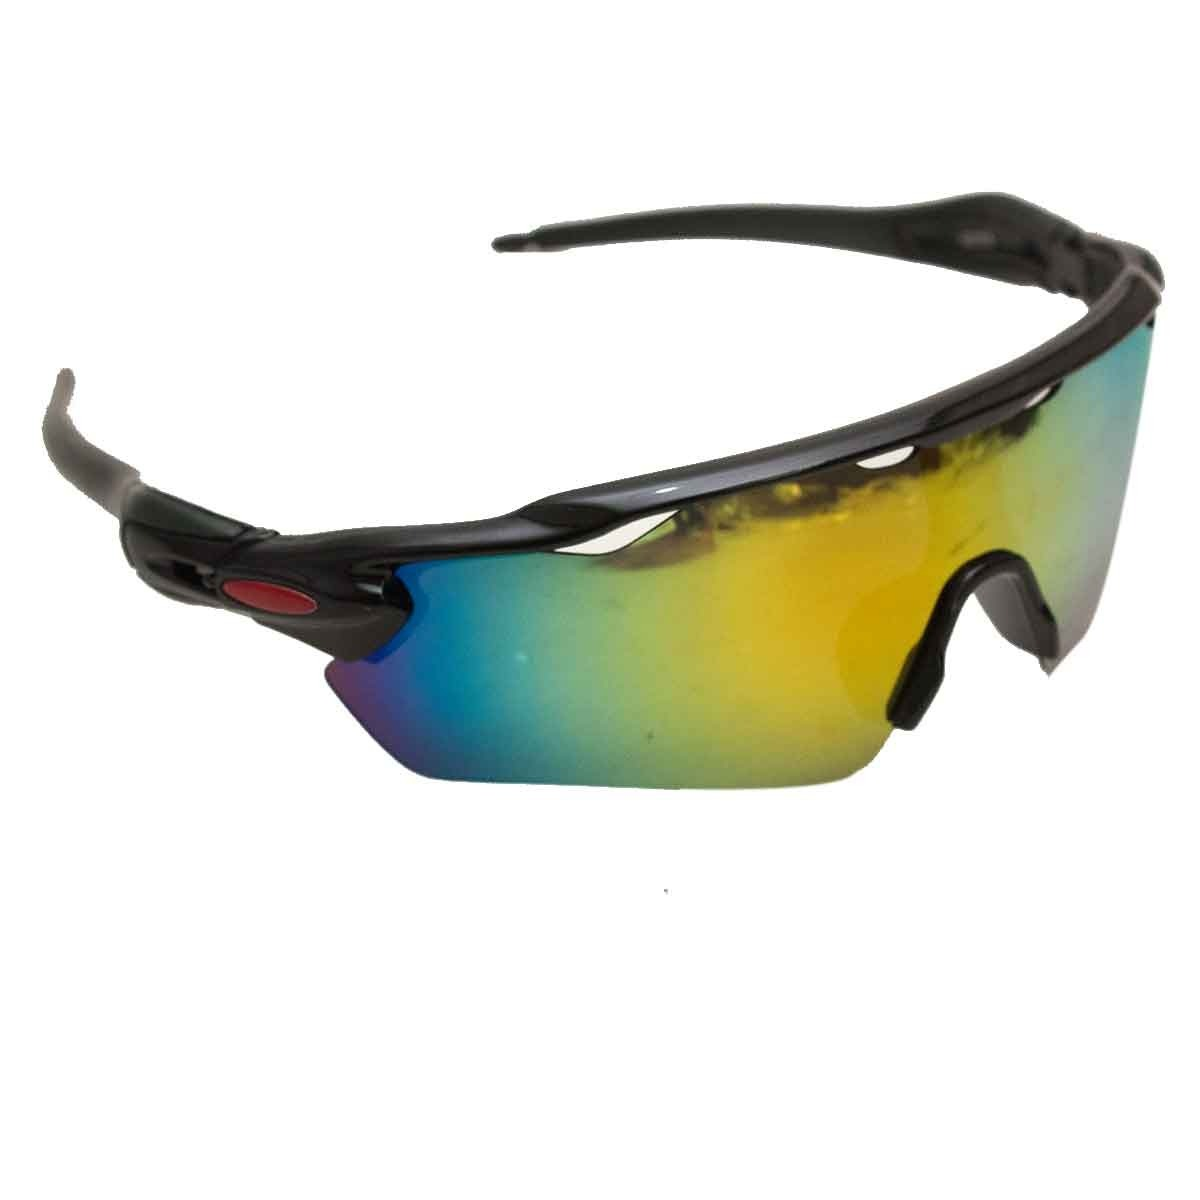 296d43ead3a75 Mlb oculos esportivo sol bike ciclismo proteco uv sol jpg 1200x1200 Sol  protecao esporte Oculos para